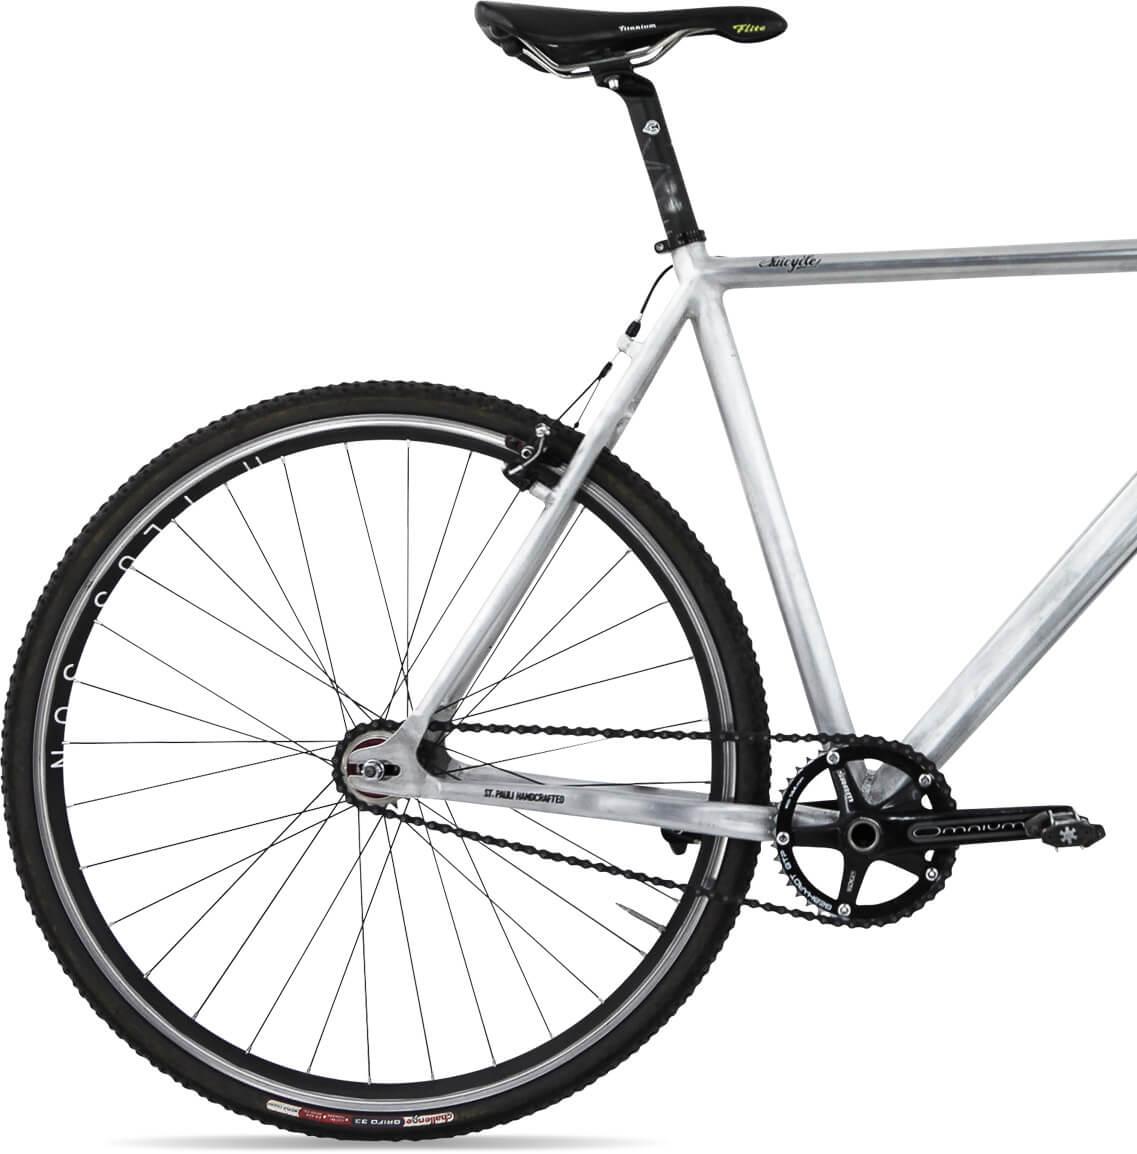 Freistellen Bildbearbeitung Fahrrad Hinterrad